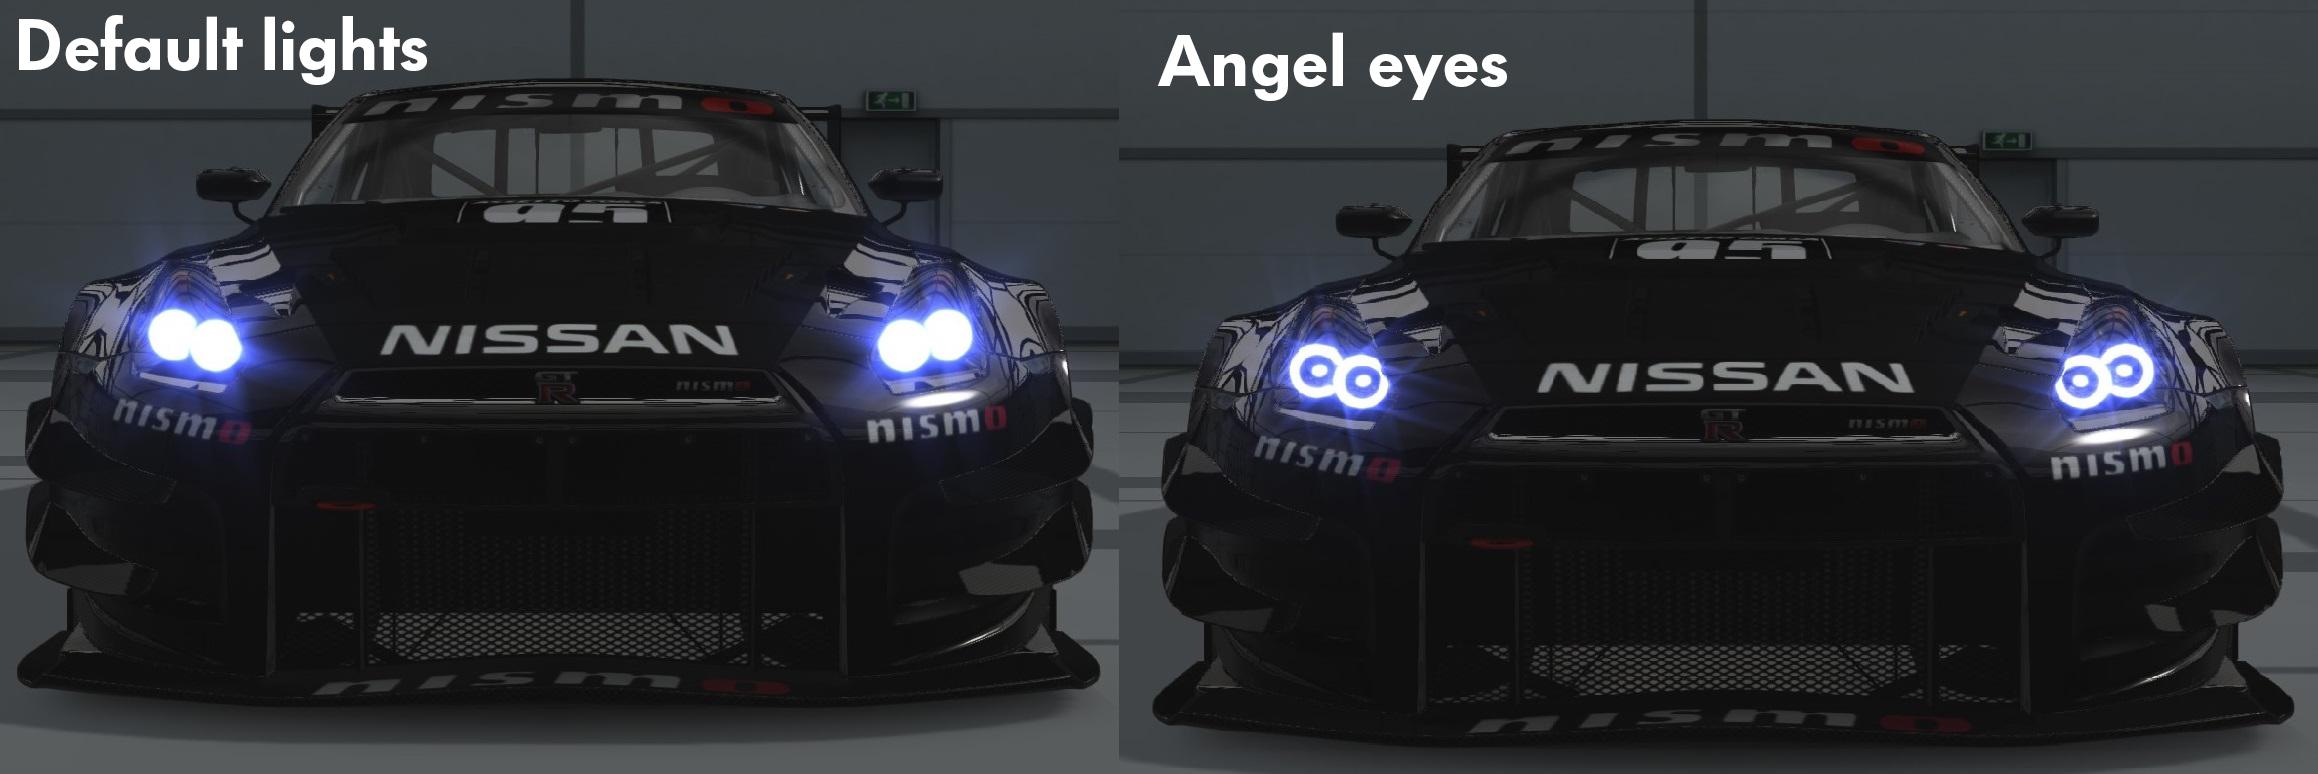 Default lights.jpg